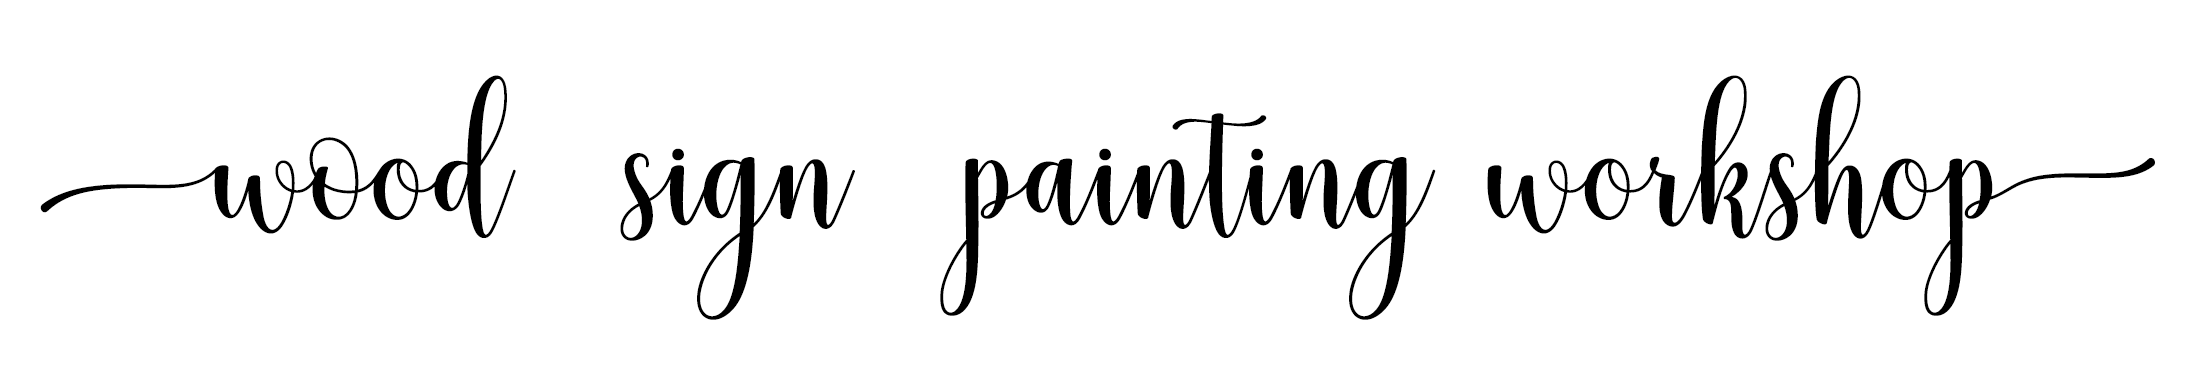 sign painting workshop